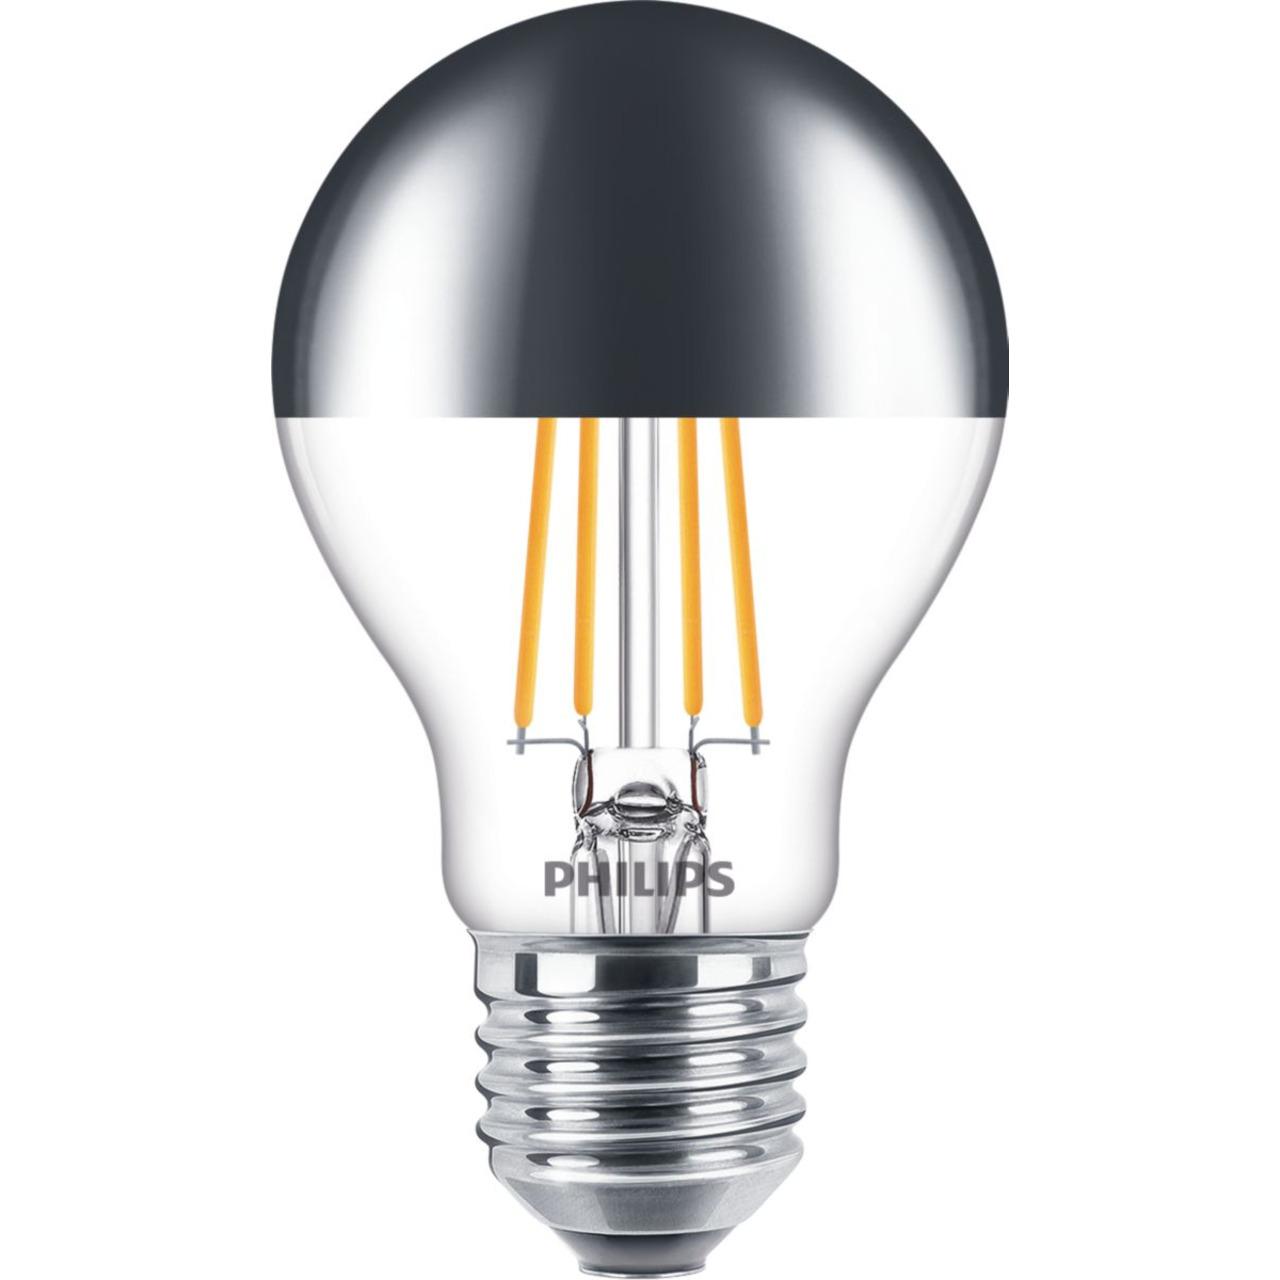 Philips 7-5-W-LED-Spiegelkopflampe E27- dimmbar